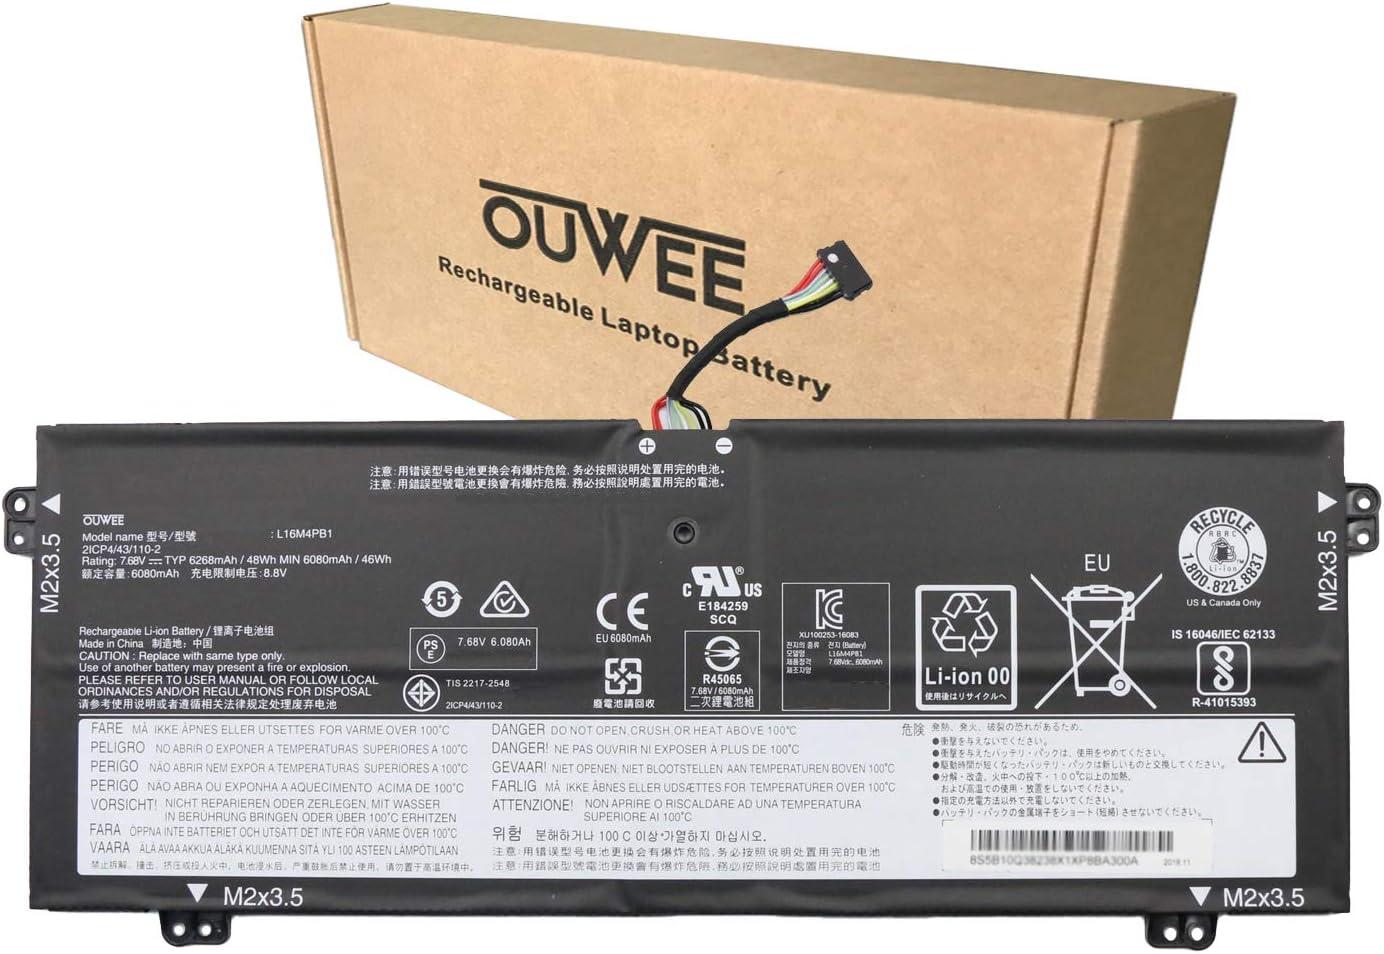 OUWEE L16M4PB1 Laptop Battery Compatible With Lenovo Yoga 730-13IWL ideapad Yoga 720-13IKB 730-13IKB Series Notebook L16L4PB1 5B10M52738 L16C4PB1 5B10M52739 5B10M52740 5B10Q38237 5B10Q38238 7.68V 48Wh